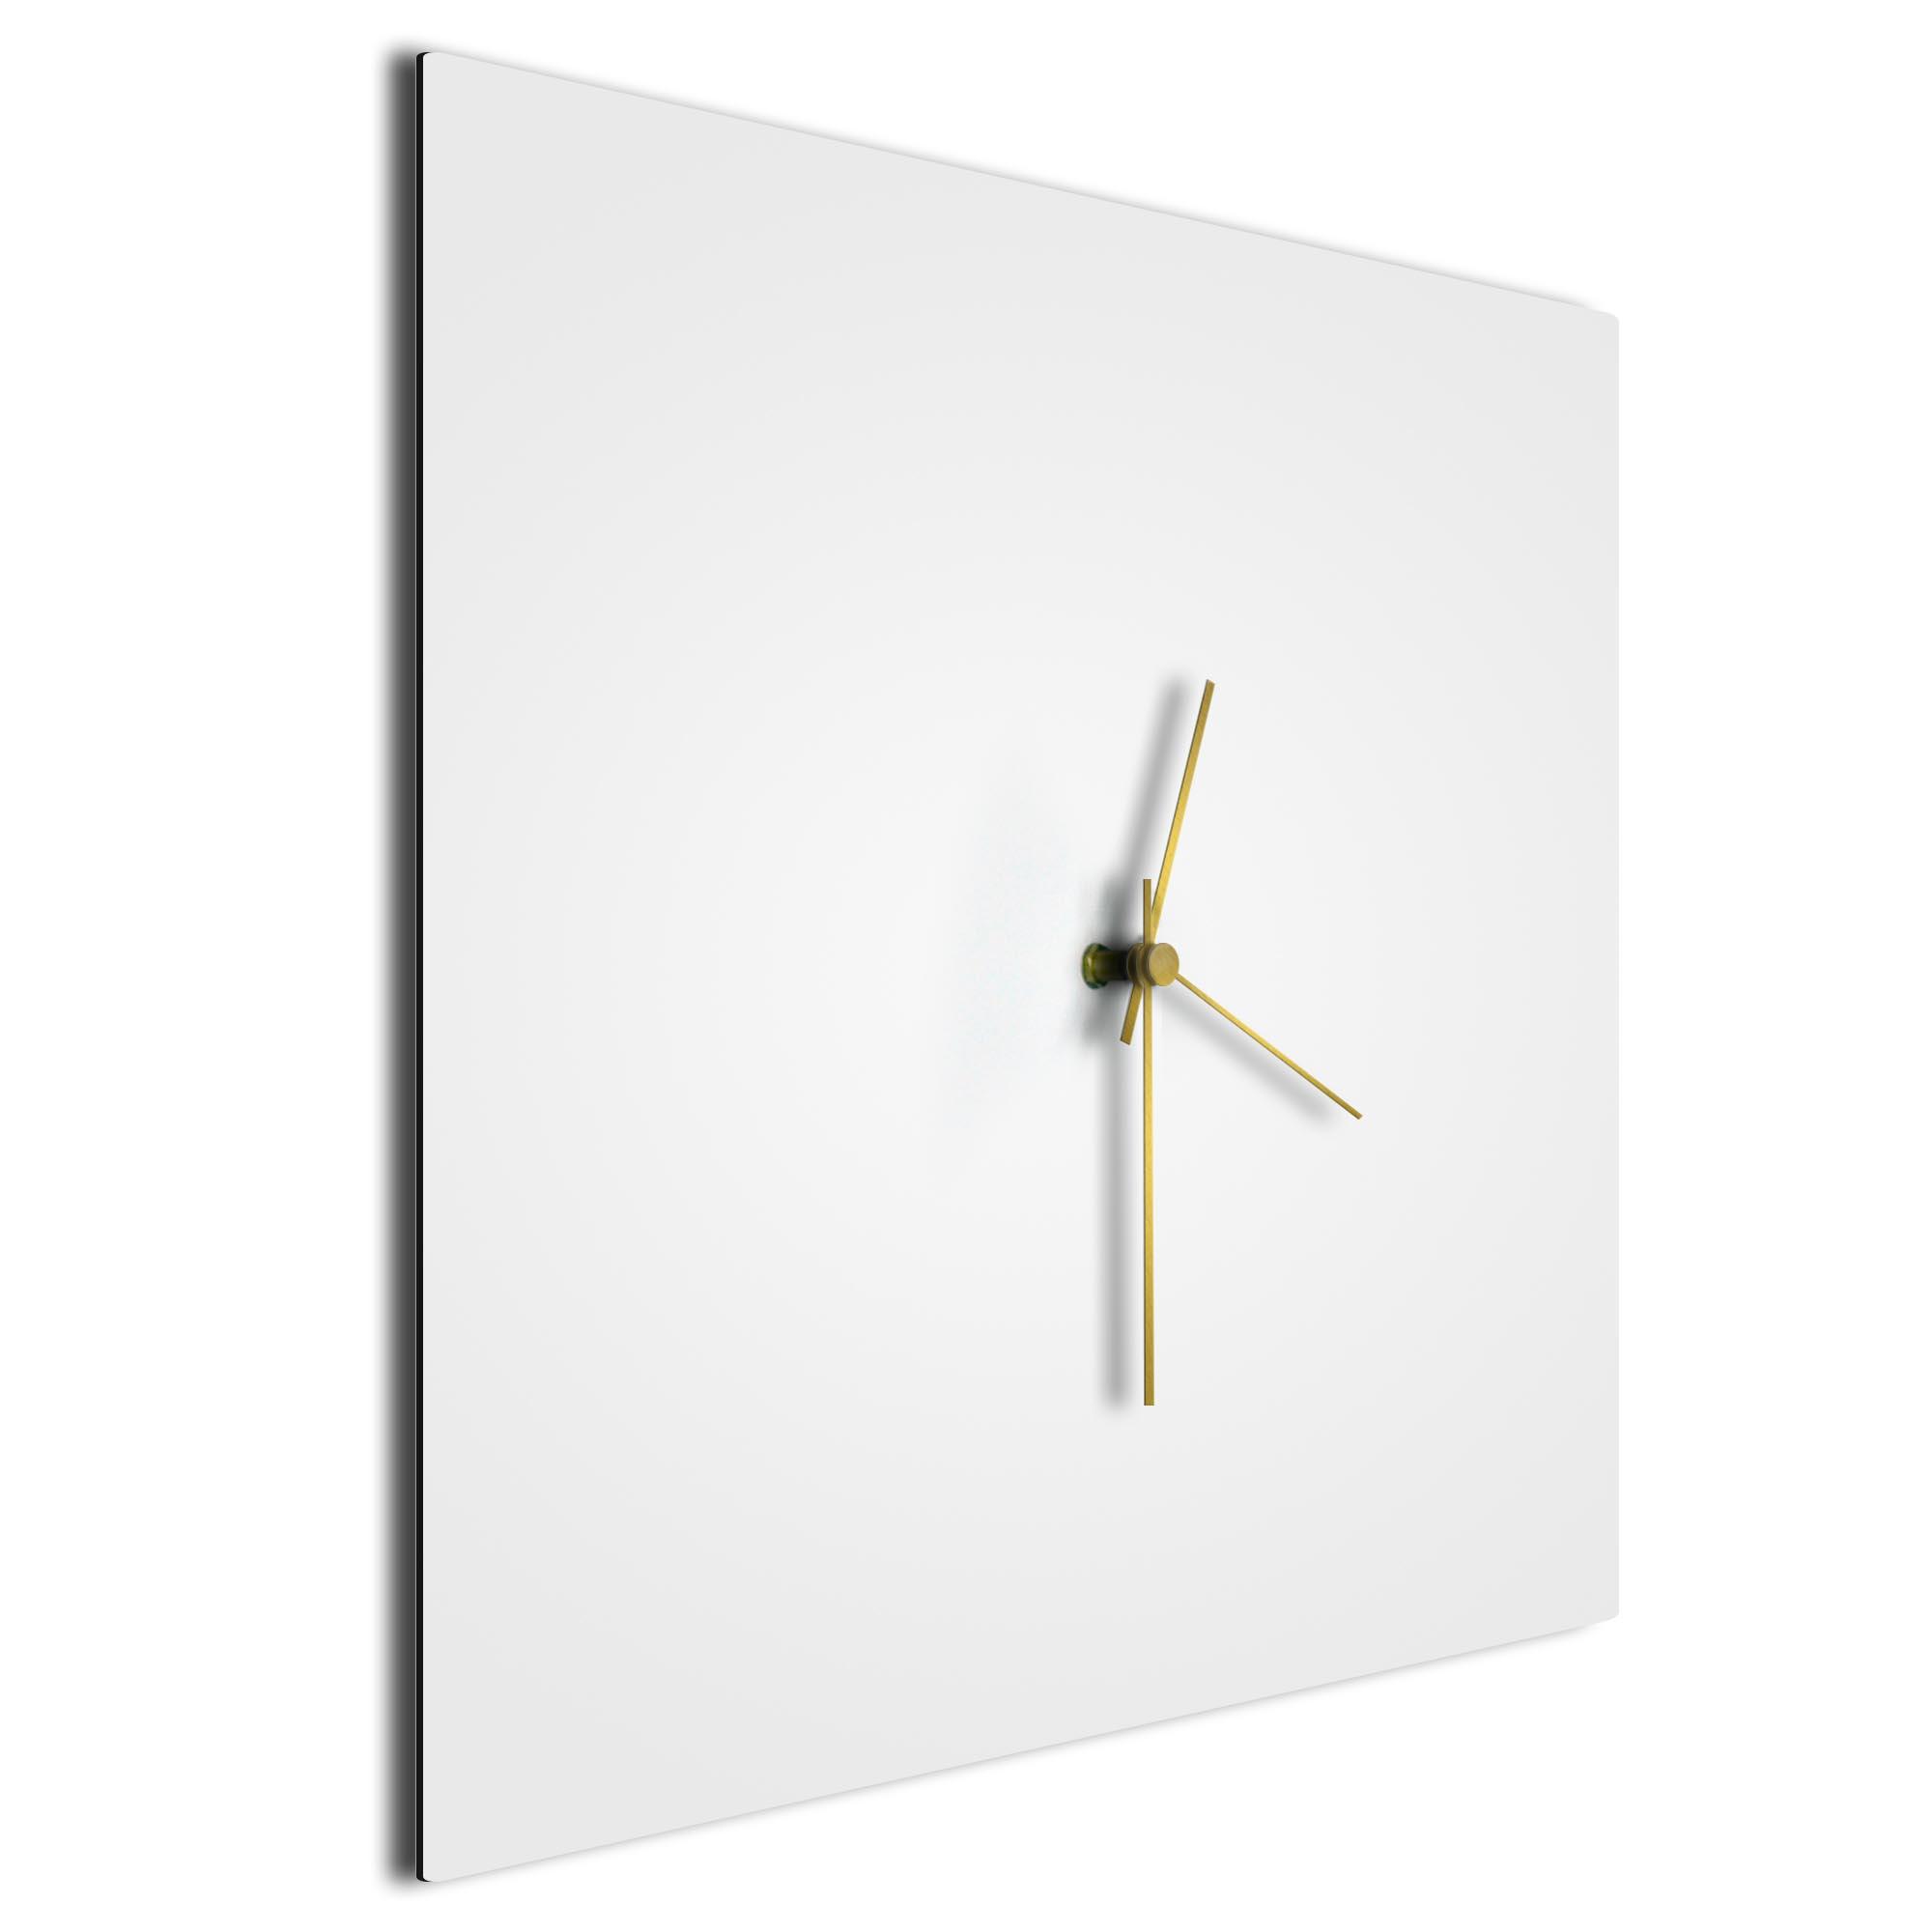 Whiteout Gold Square Clock Large - Image 2